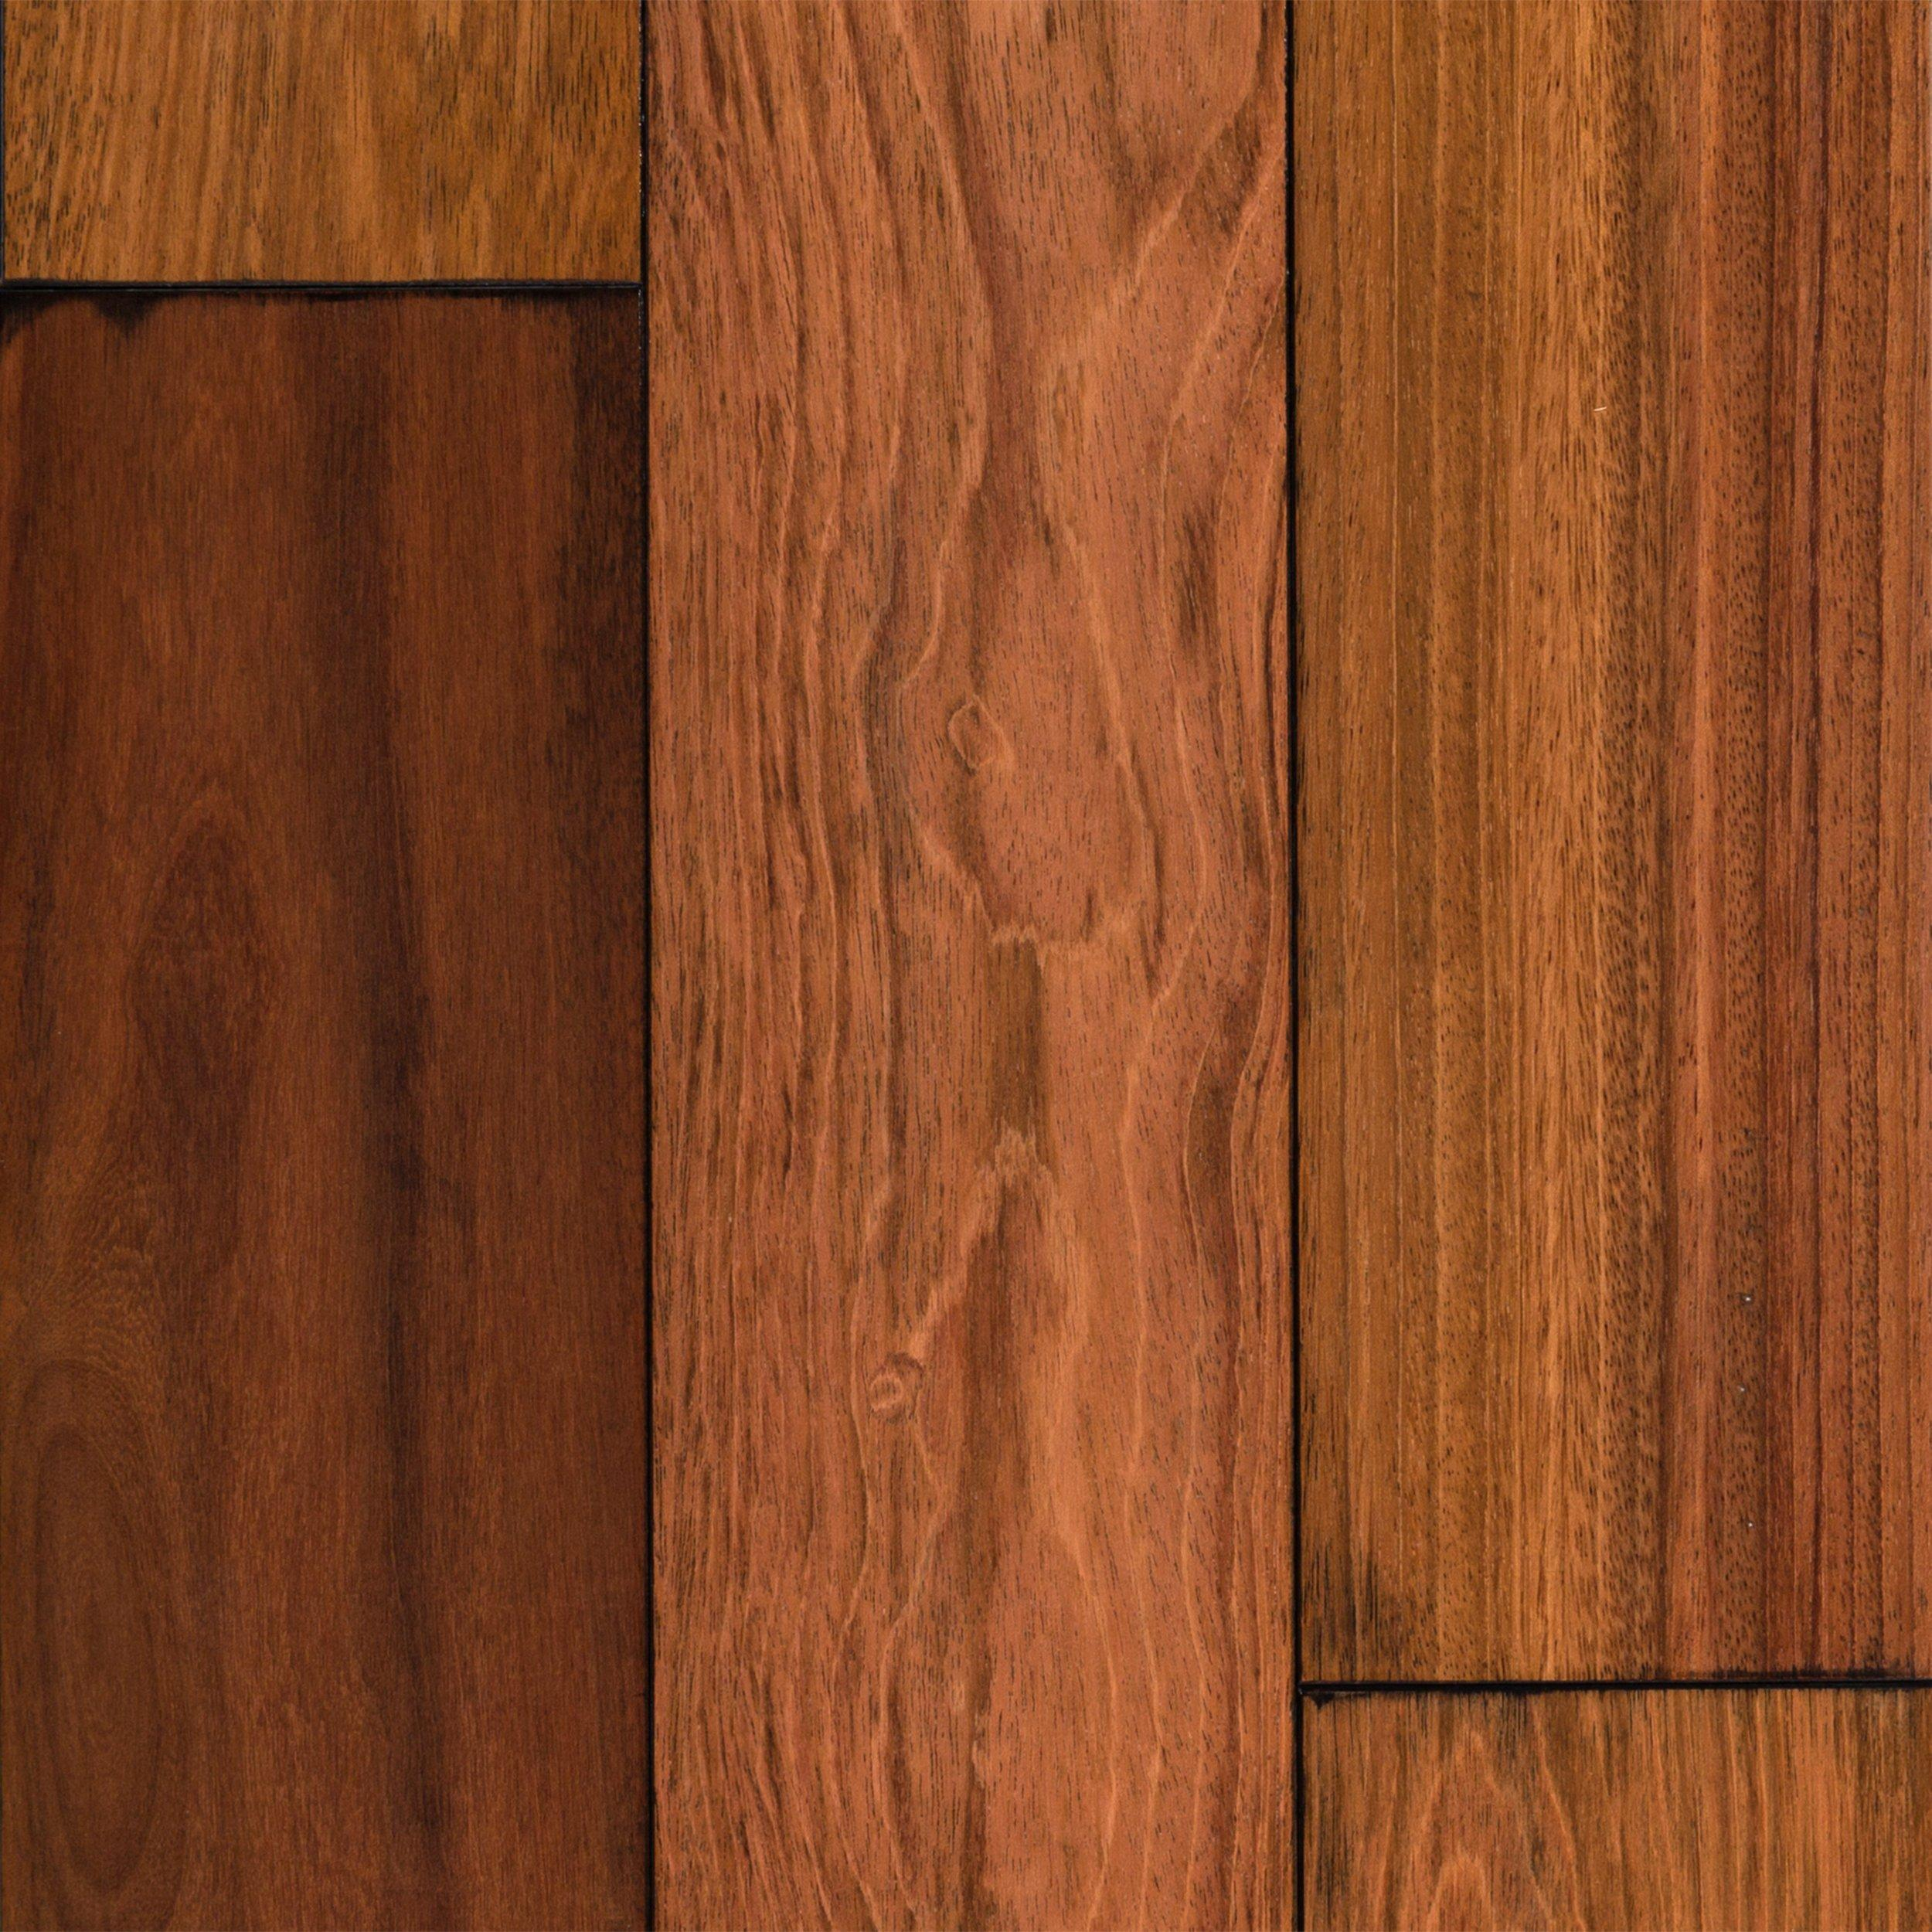 Natural Brazilian Cherry Hand Scraped Solid Hardwood   3/4in. X 5 1/2in.    100120609 | Floor And Decor